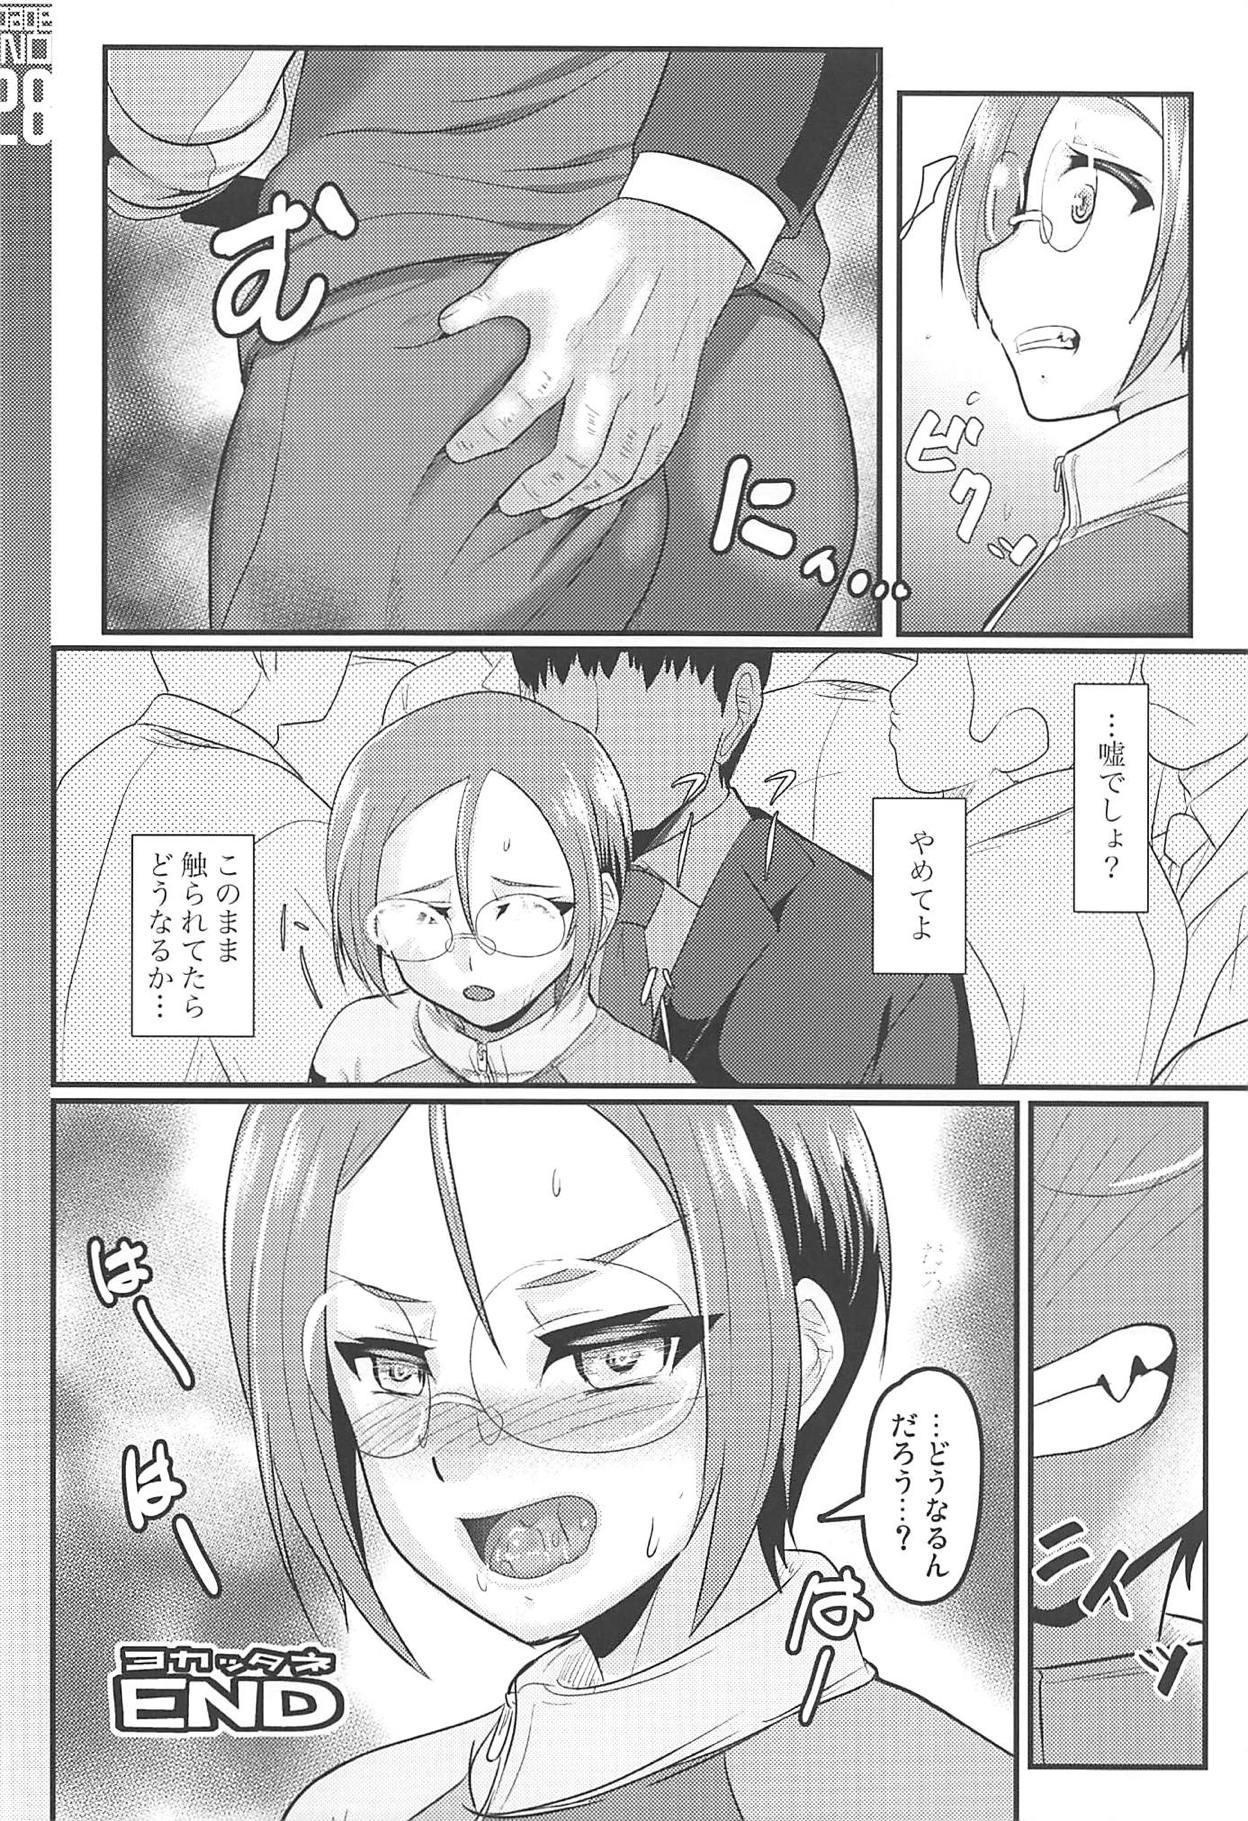 (Panzer Vor! 15) [Trample Rigger (Yequo)] Zoku [Ru-gata] Avenger Shoushitsu Jiken (Girls und Panzer) 26